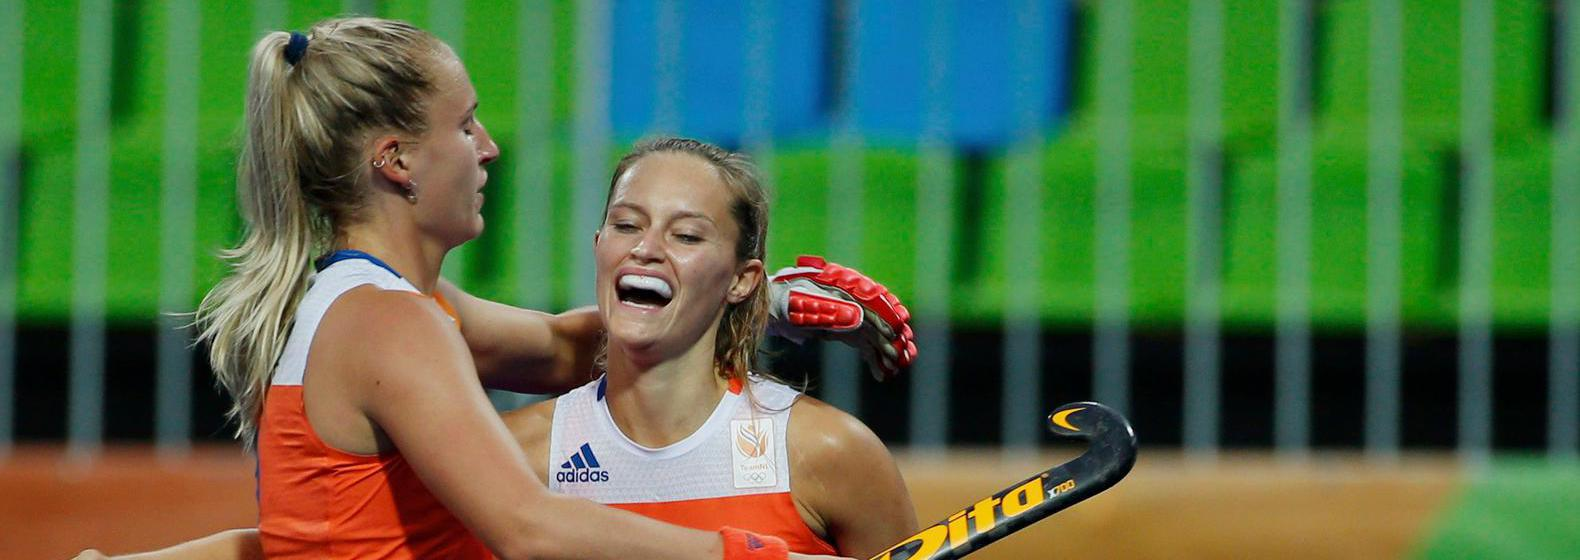 Tweede overwinning Nederlandse hockeydames